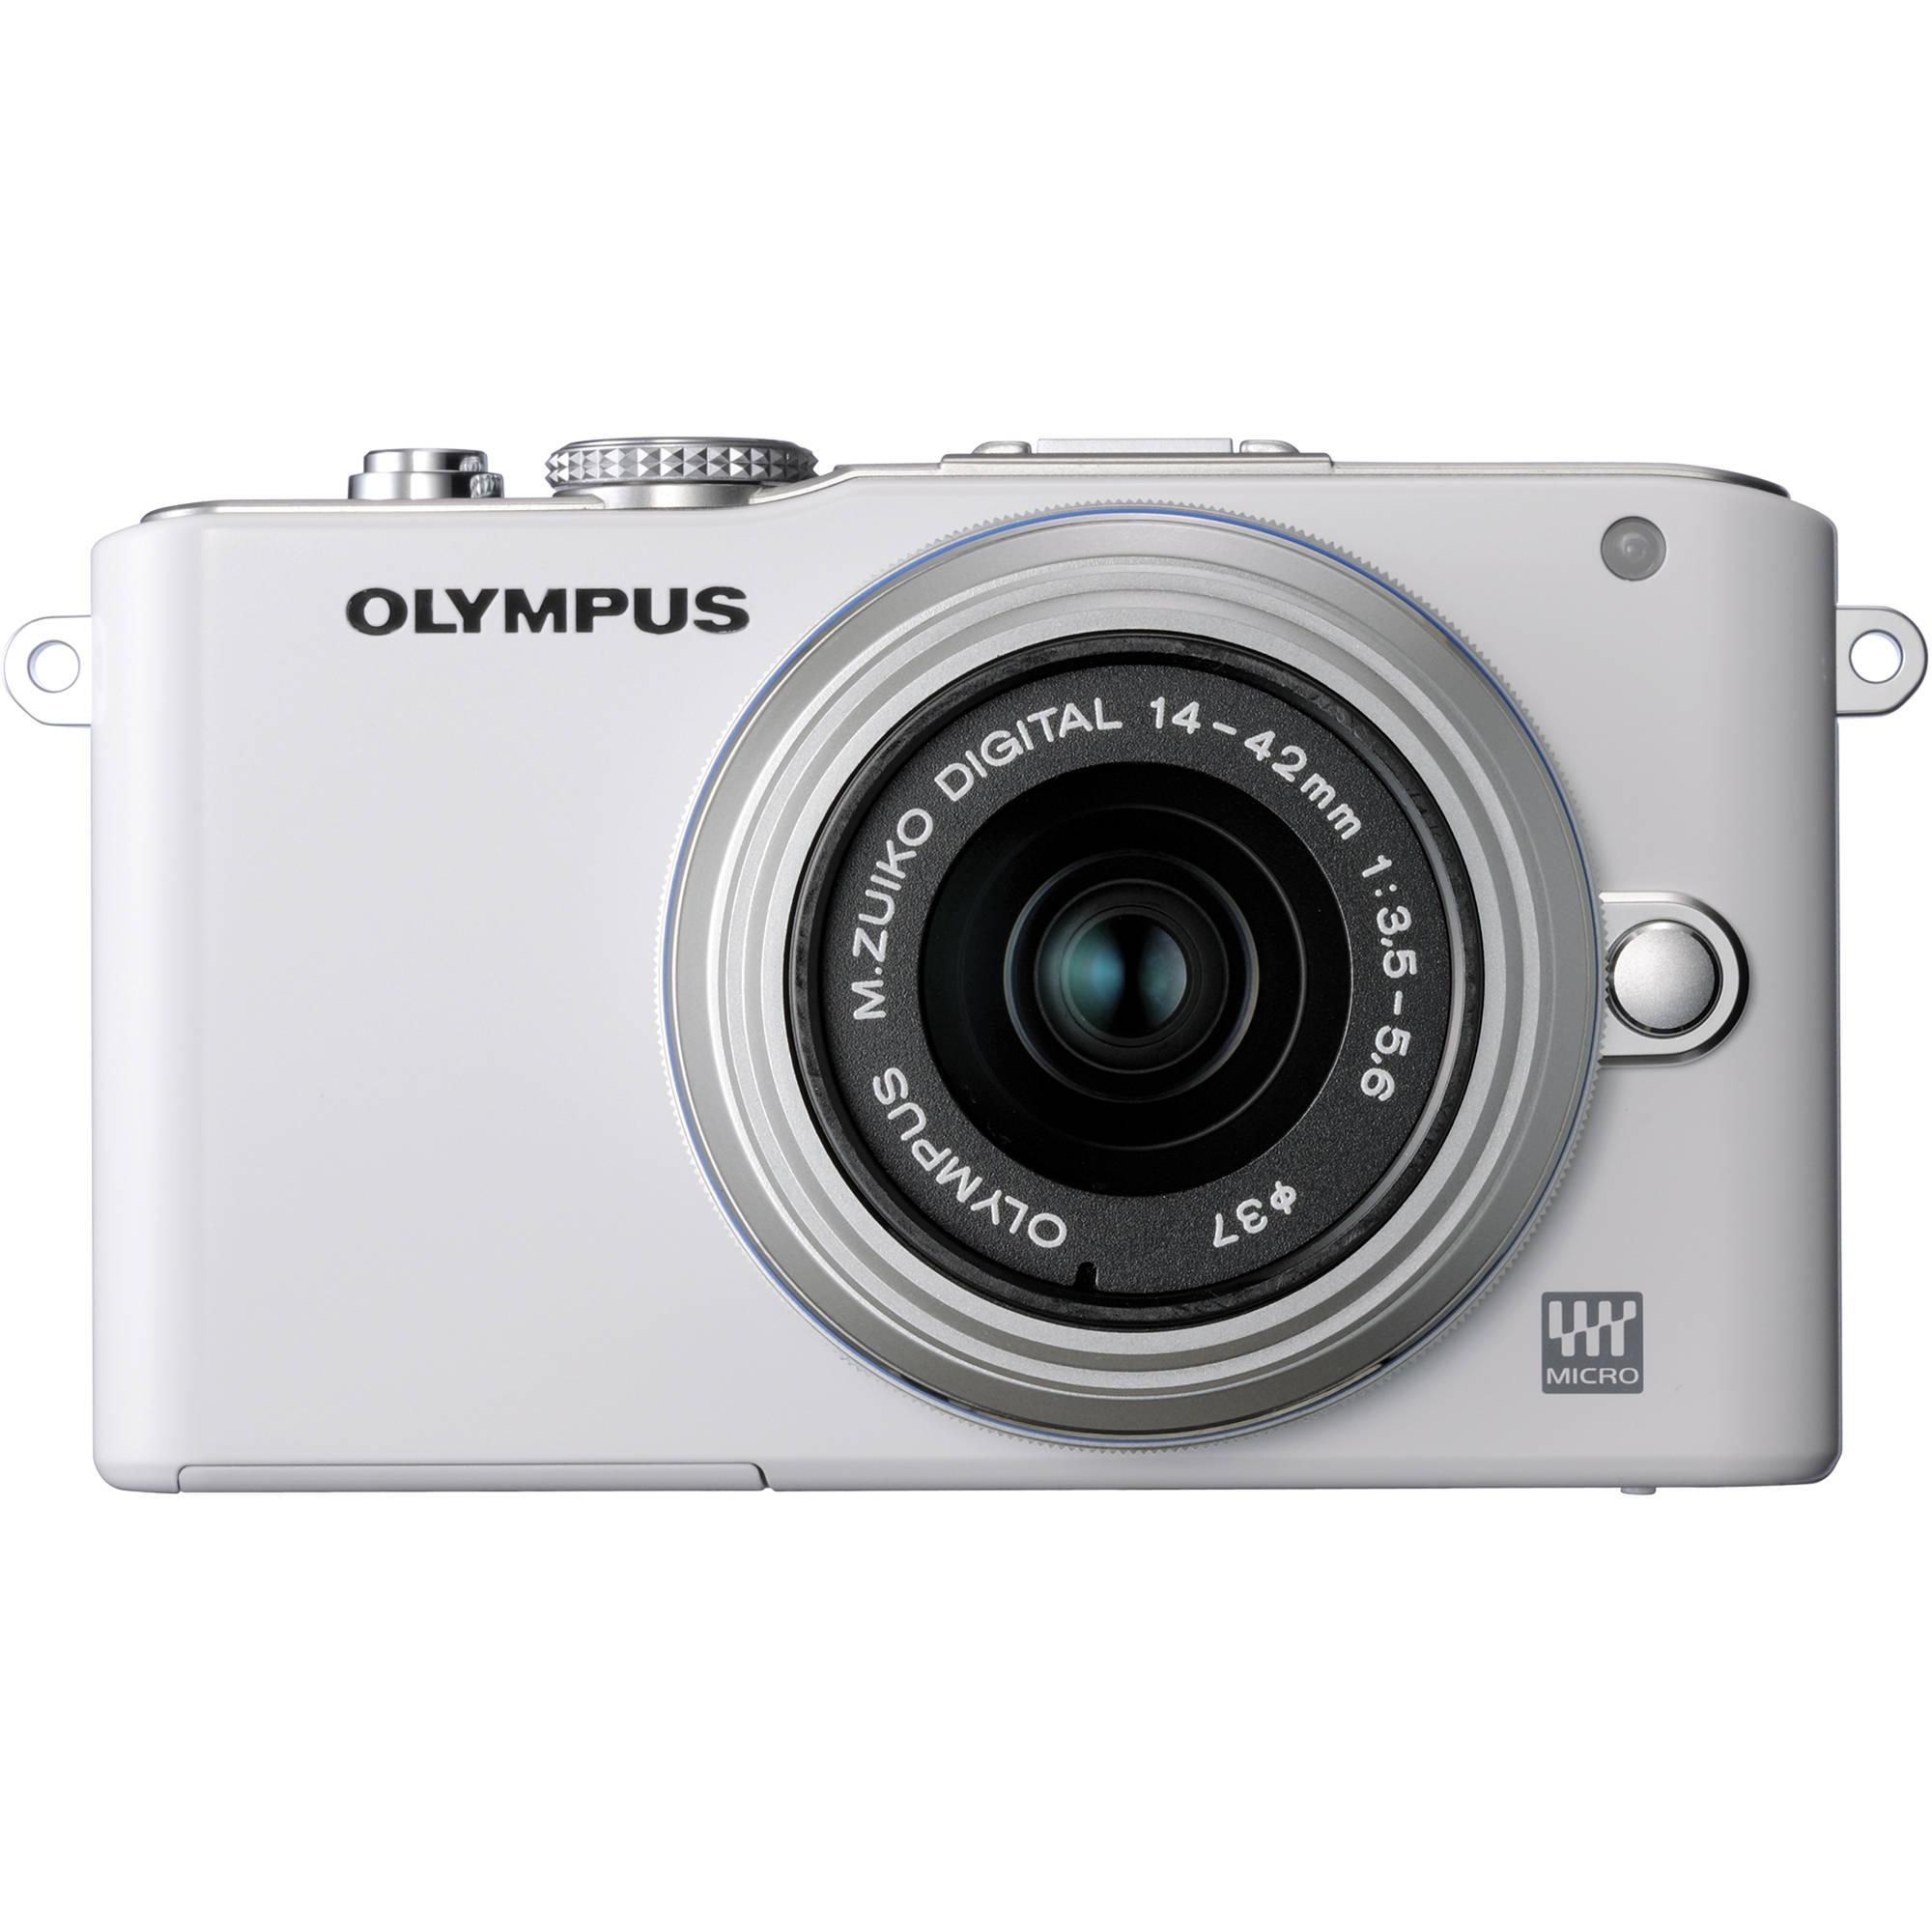 olympus e pl3 mirrorless micro four thirds digital v205031wu000 rh bhphotovideo com olympus e-pl3 manual olympus pen lite e-pl3 user manual